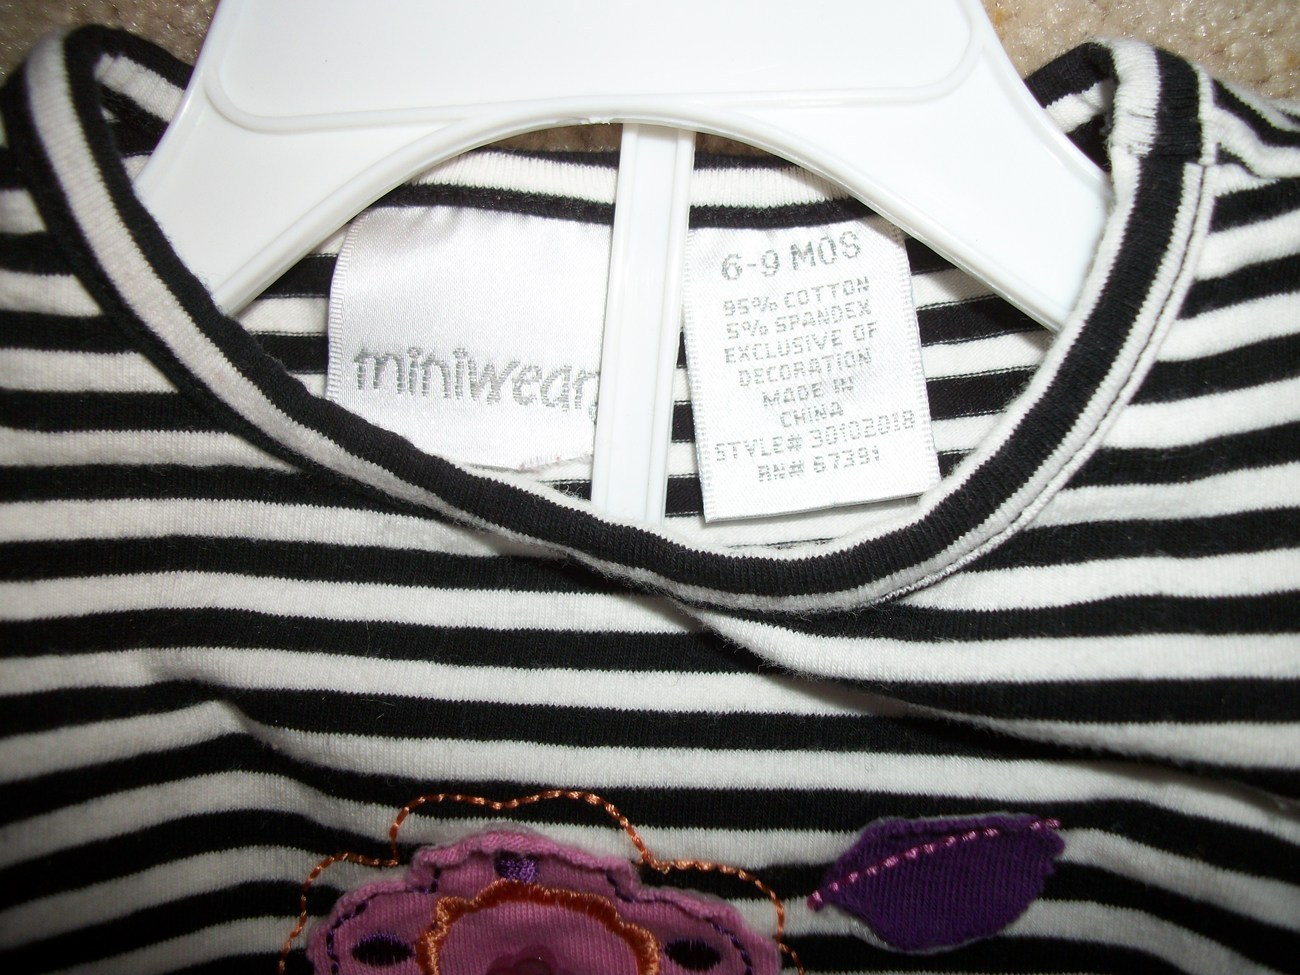 Miniwear Flower Striped Long Sleeve Shirt 6-9 Months